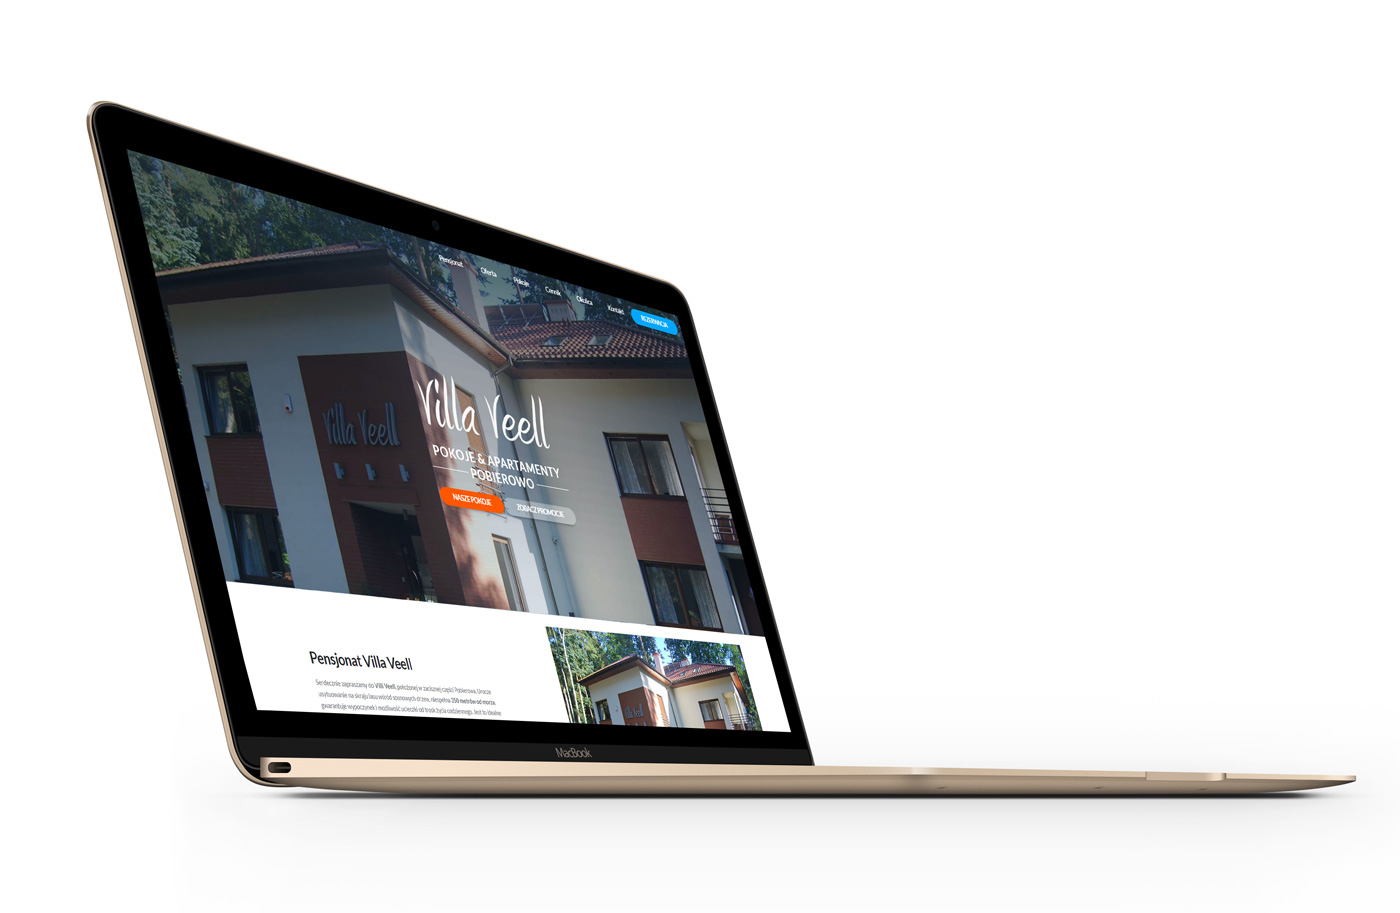 Pensjonat Pobierowo - Villa Veell - nowa strona internetowa